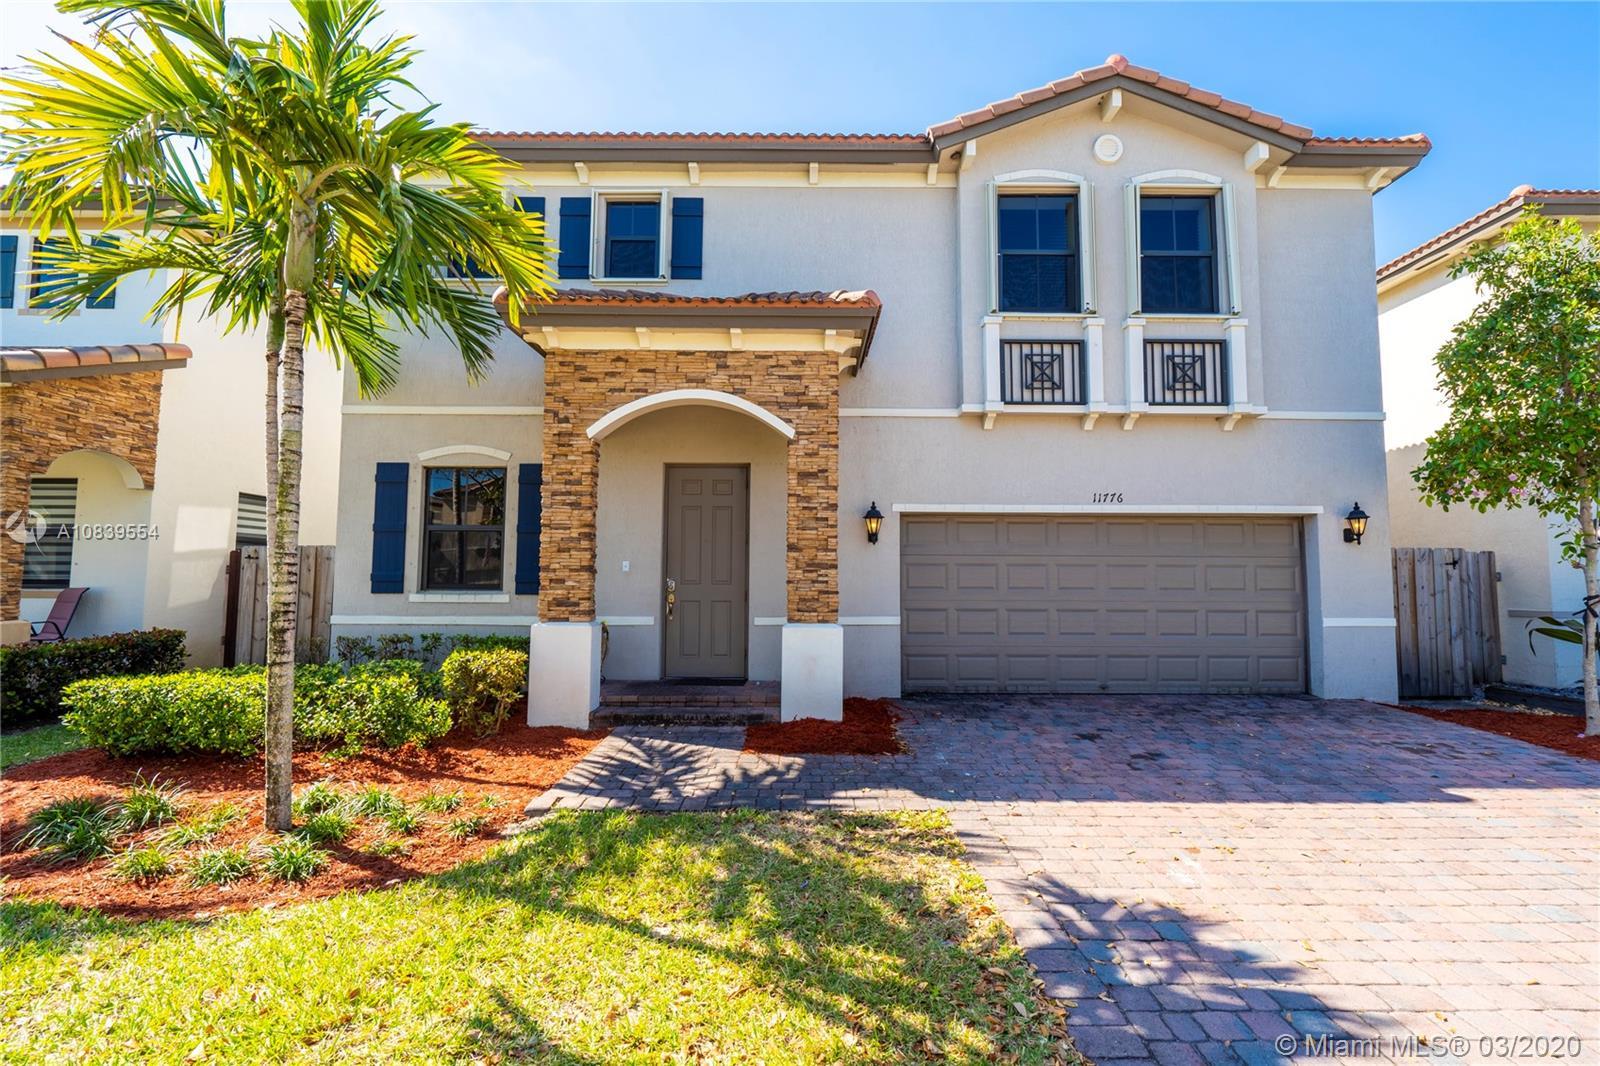 11776 SW 235th St, Homestead, FL 33032 - Homestead, FL real estate listing